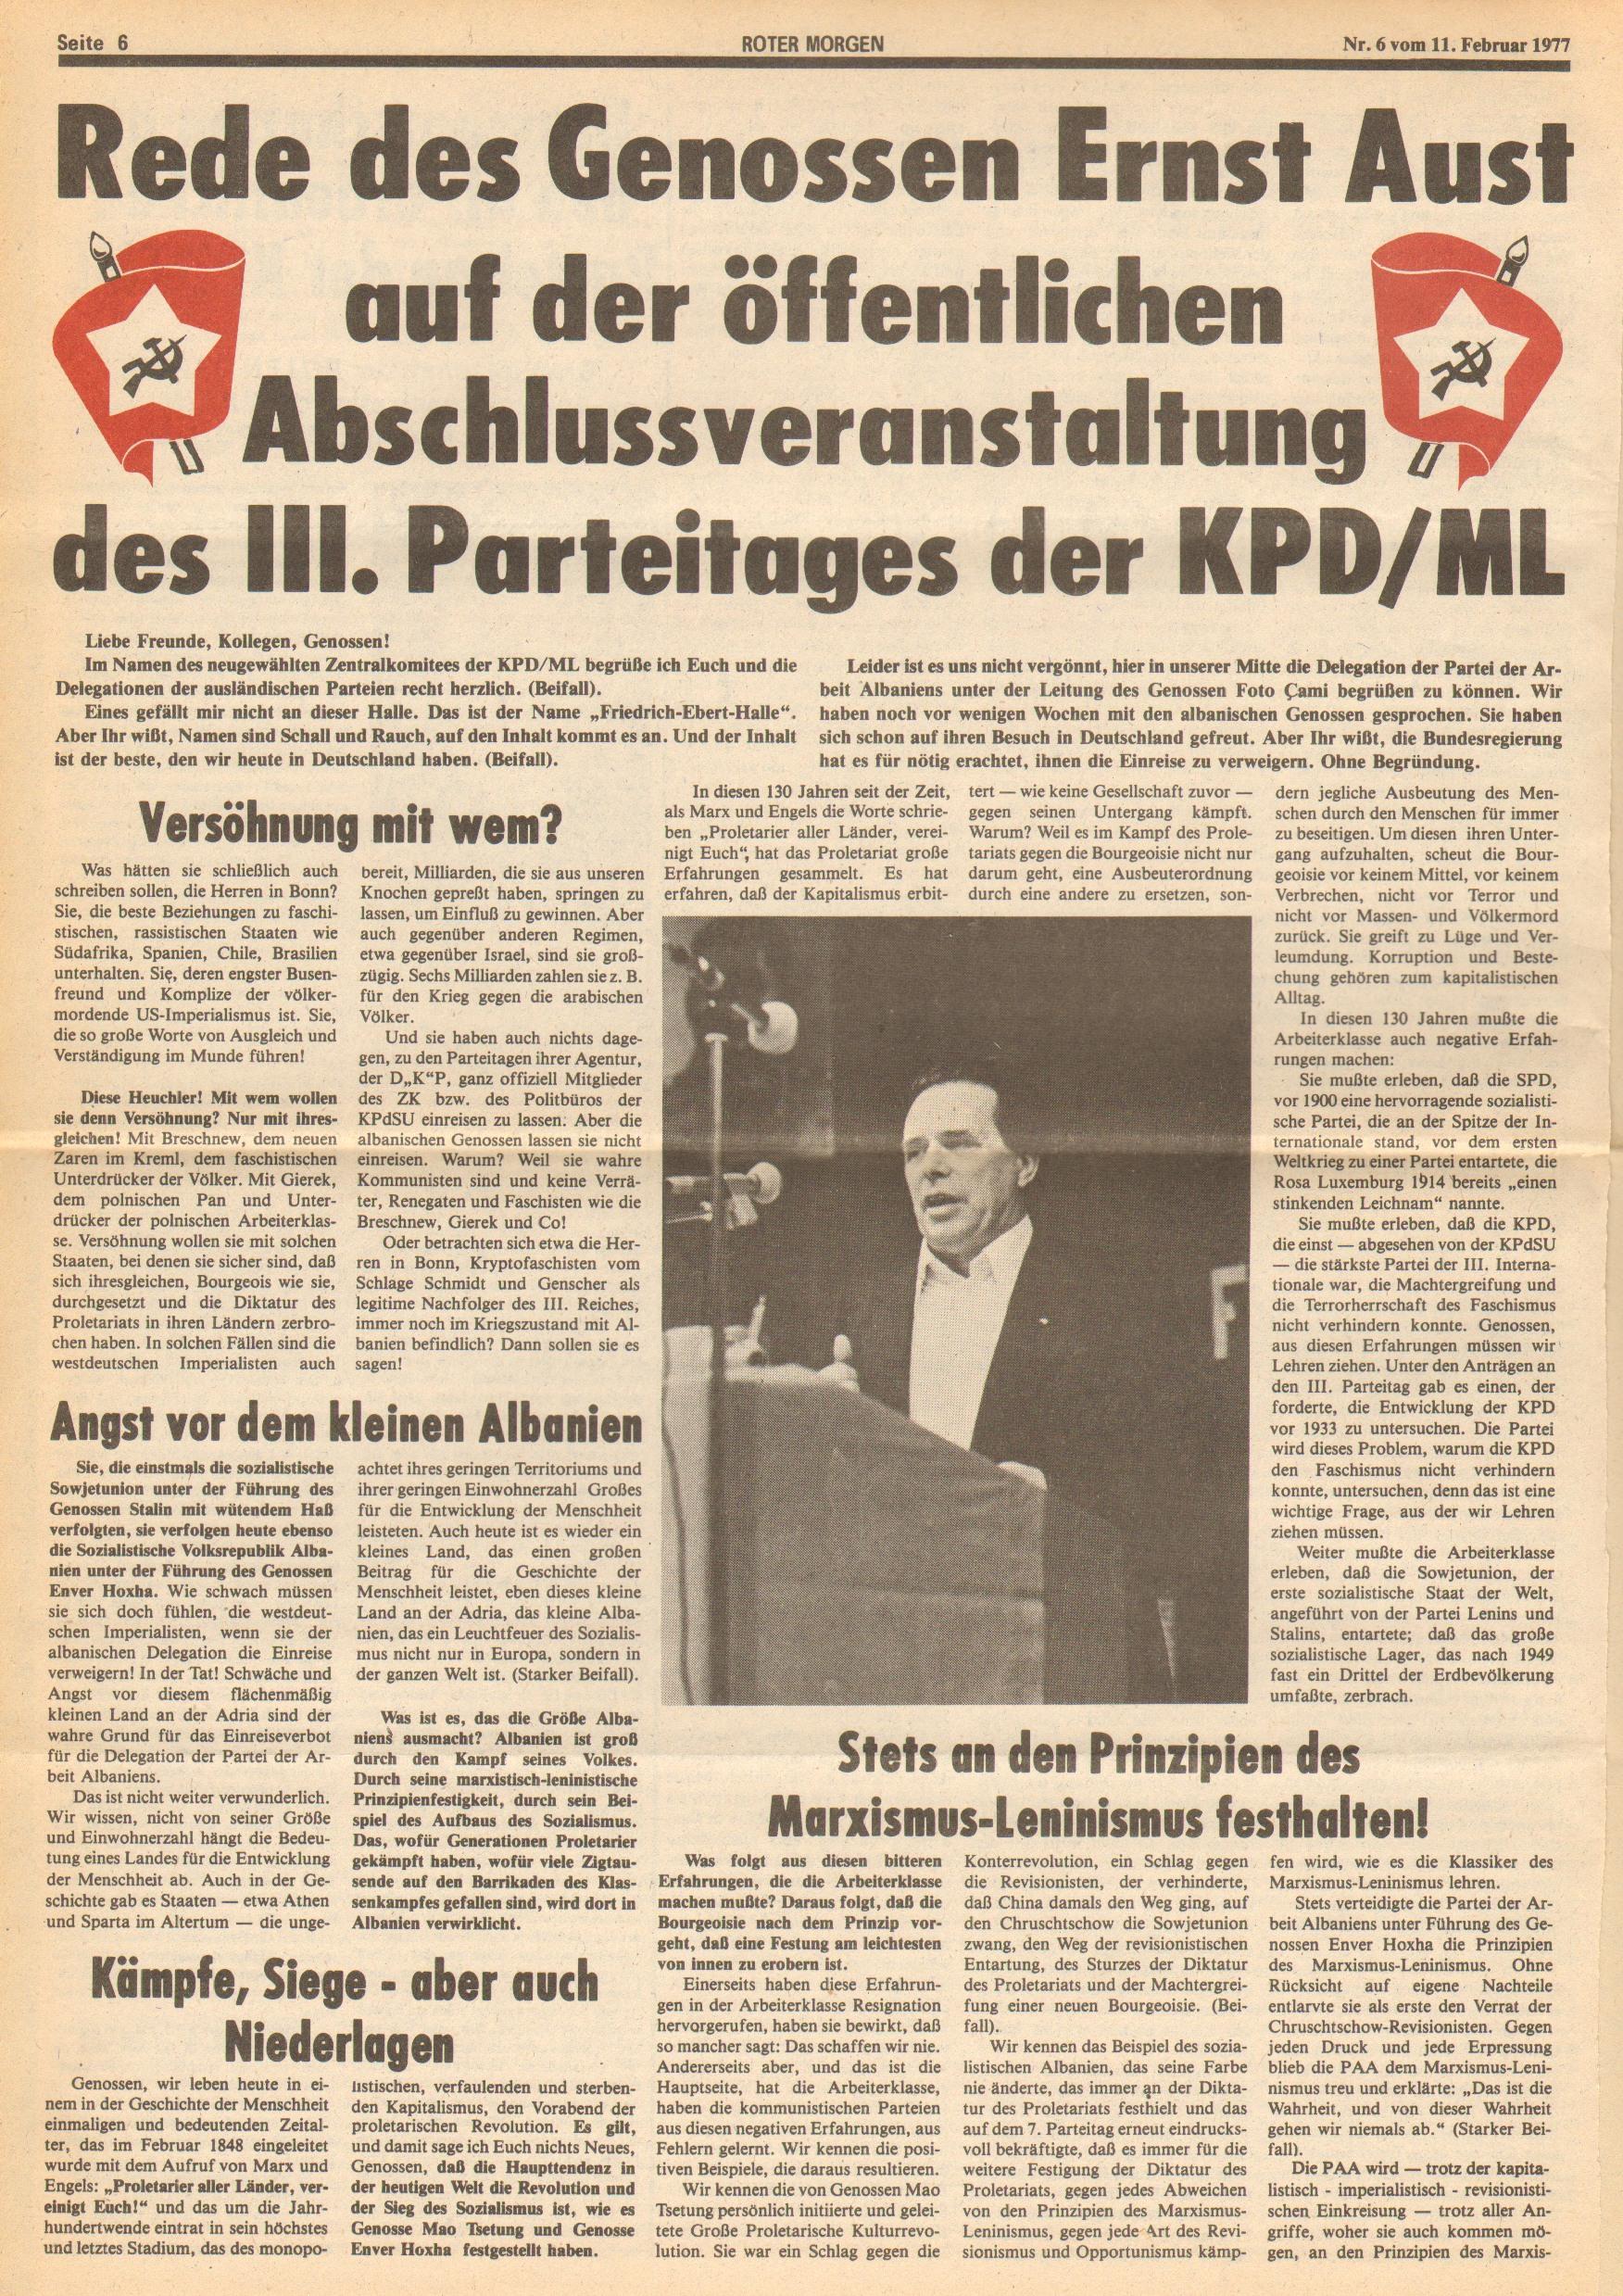 Roter Morgen, 11. Jg., 11. Februar 1977, Nr. 6, Seite 6